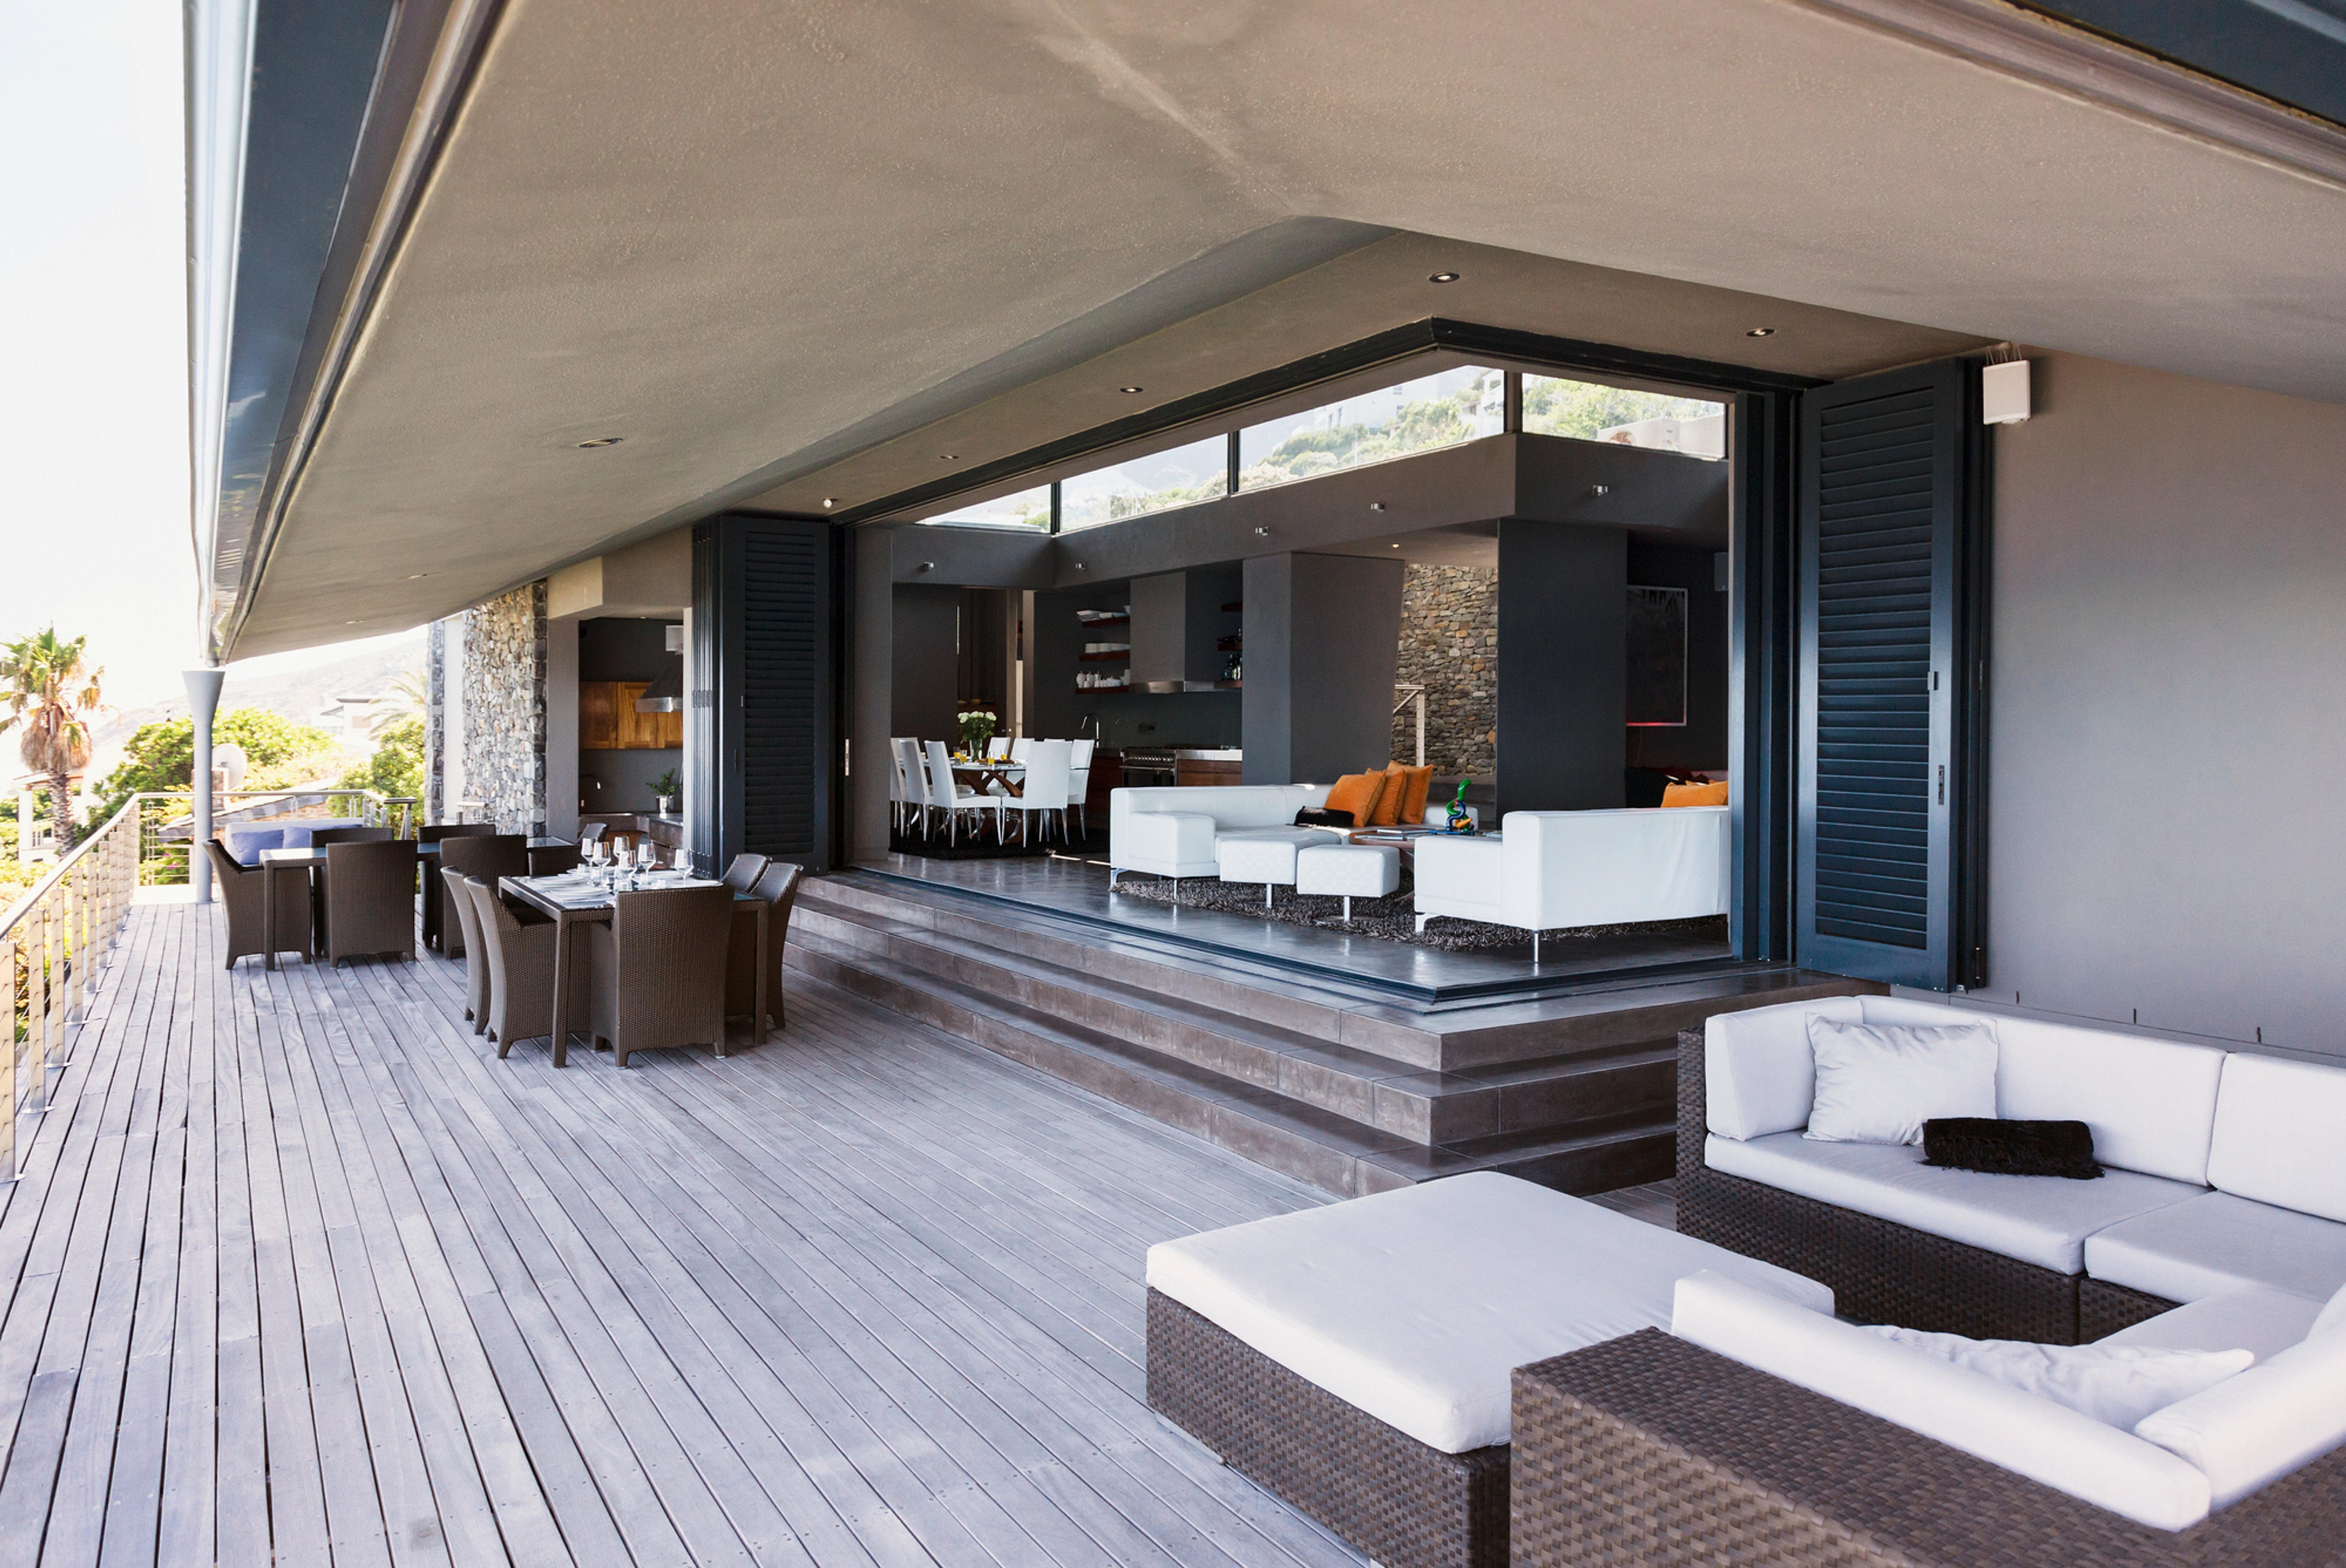 modern balcony furniture  tlzholdingscom - construcciones modern balcony furniture construcciones modern balconyfurniture